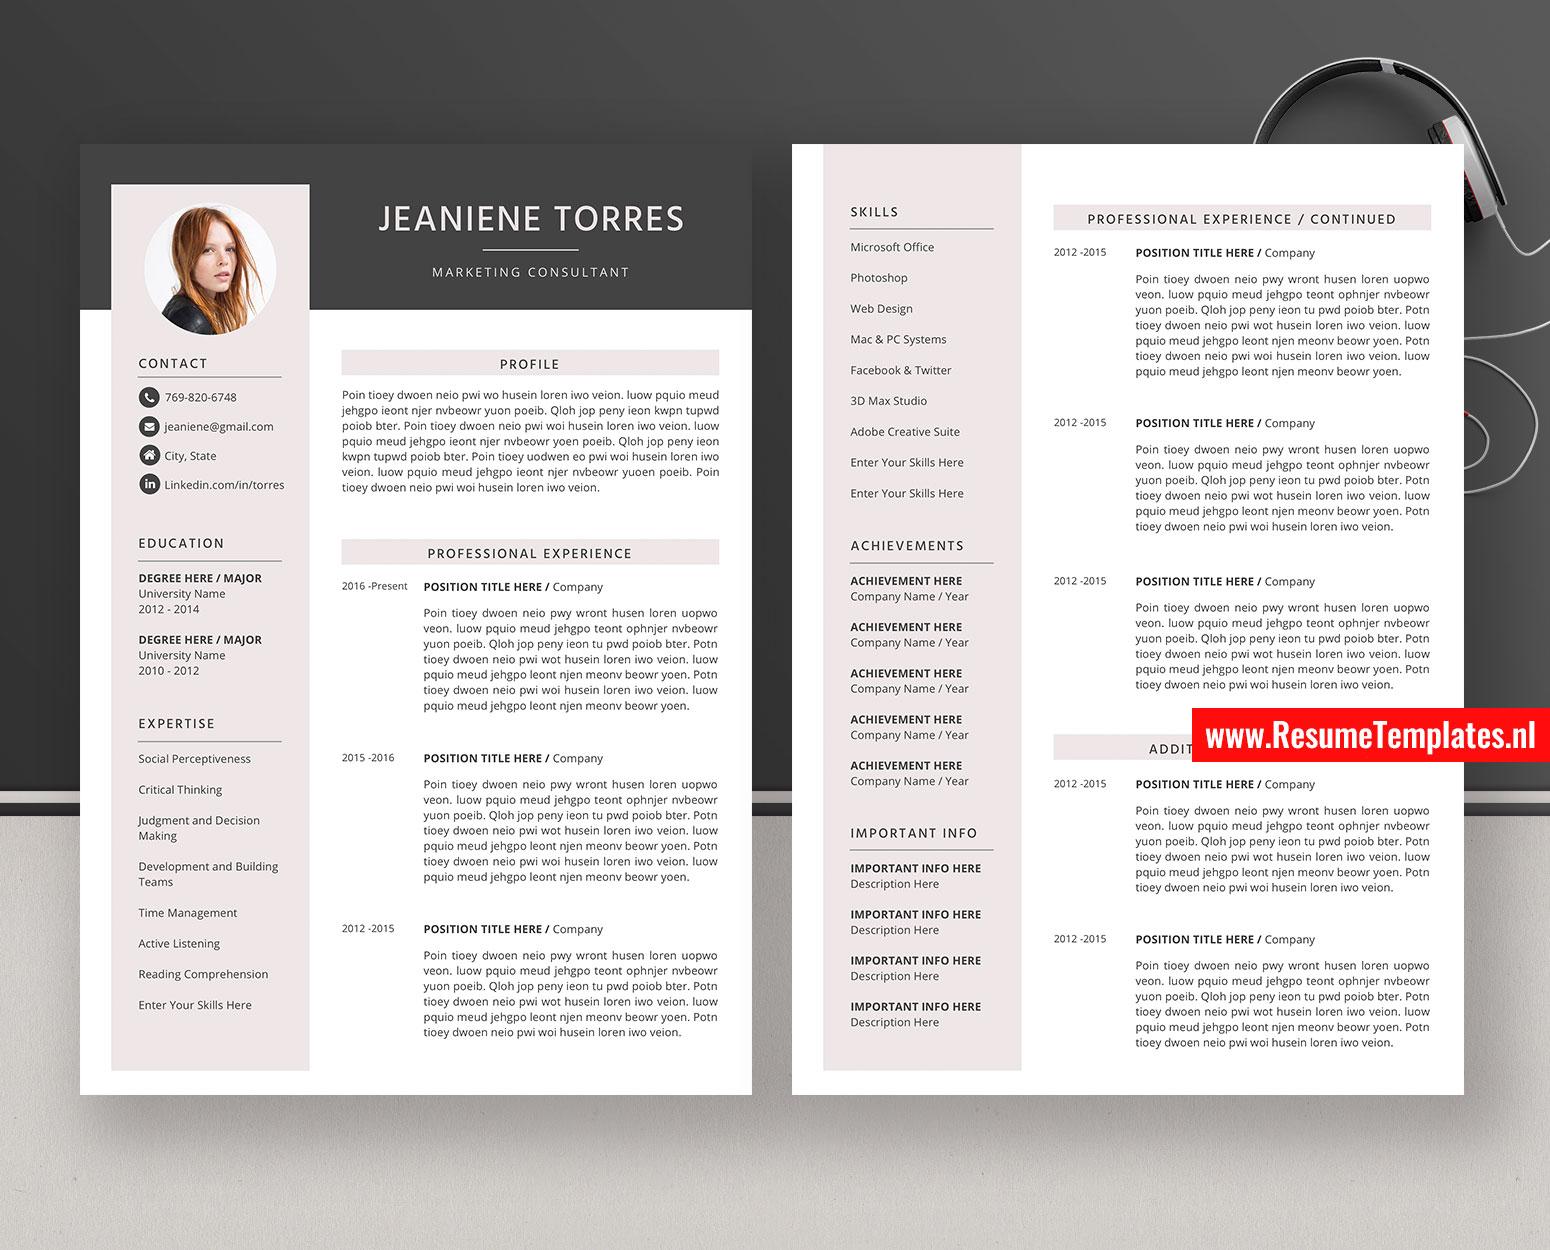 Editable CV Template / Resume Template for Microsoft Word, Curriculum Vitae, Professional Resume ...